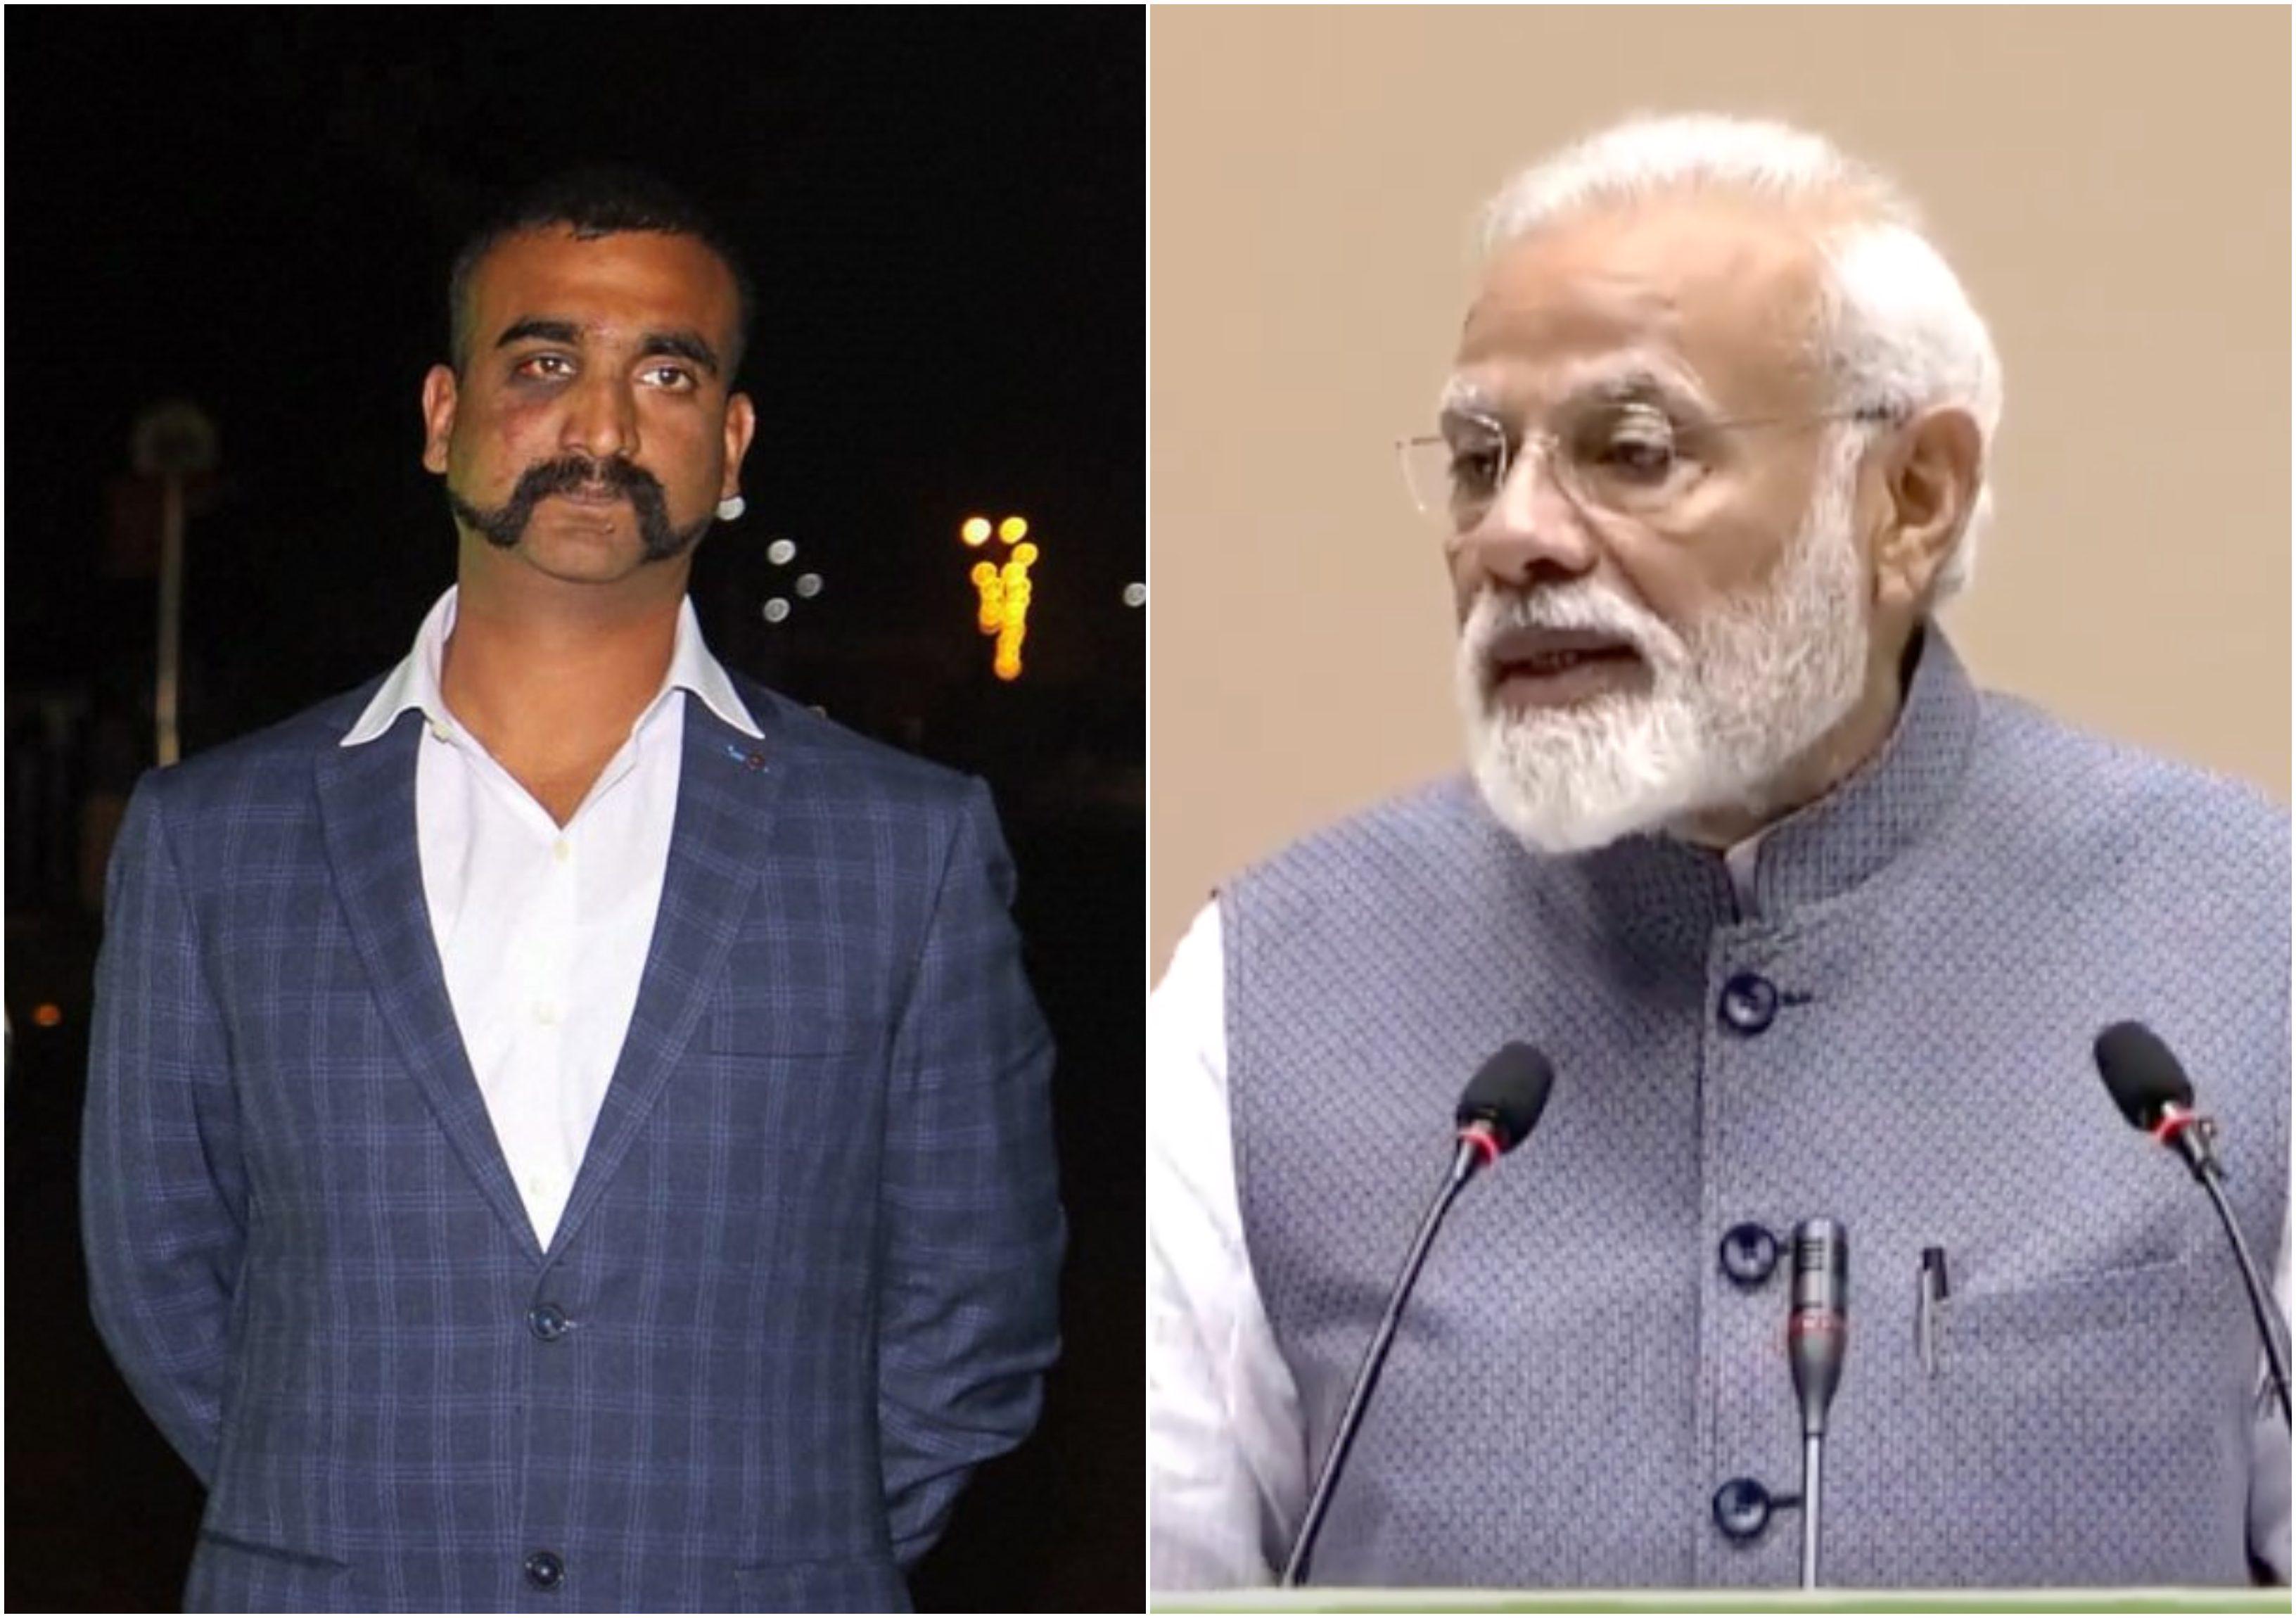 PM Modi, Prime Minister, Narendra Modi, Wing Commander, Abhinandan, NewsMobile, Mobile, News, India